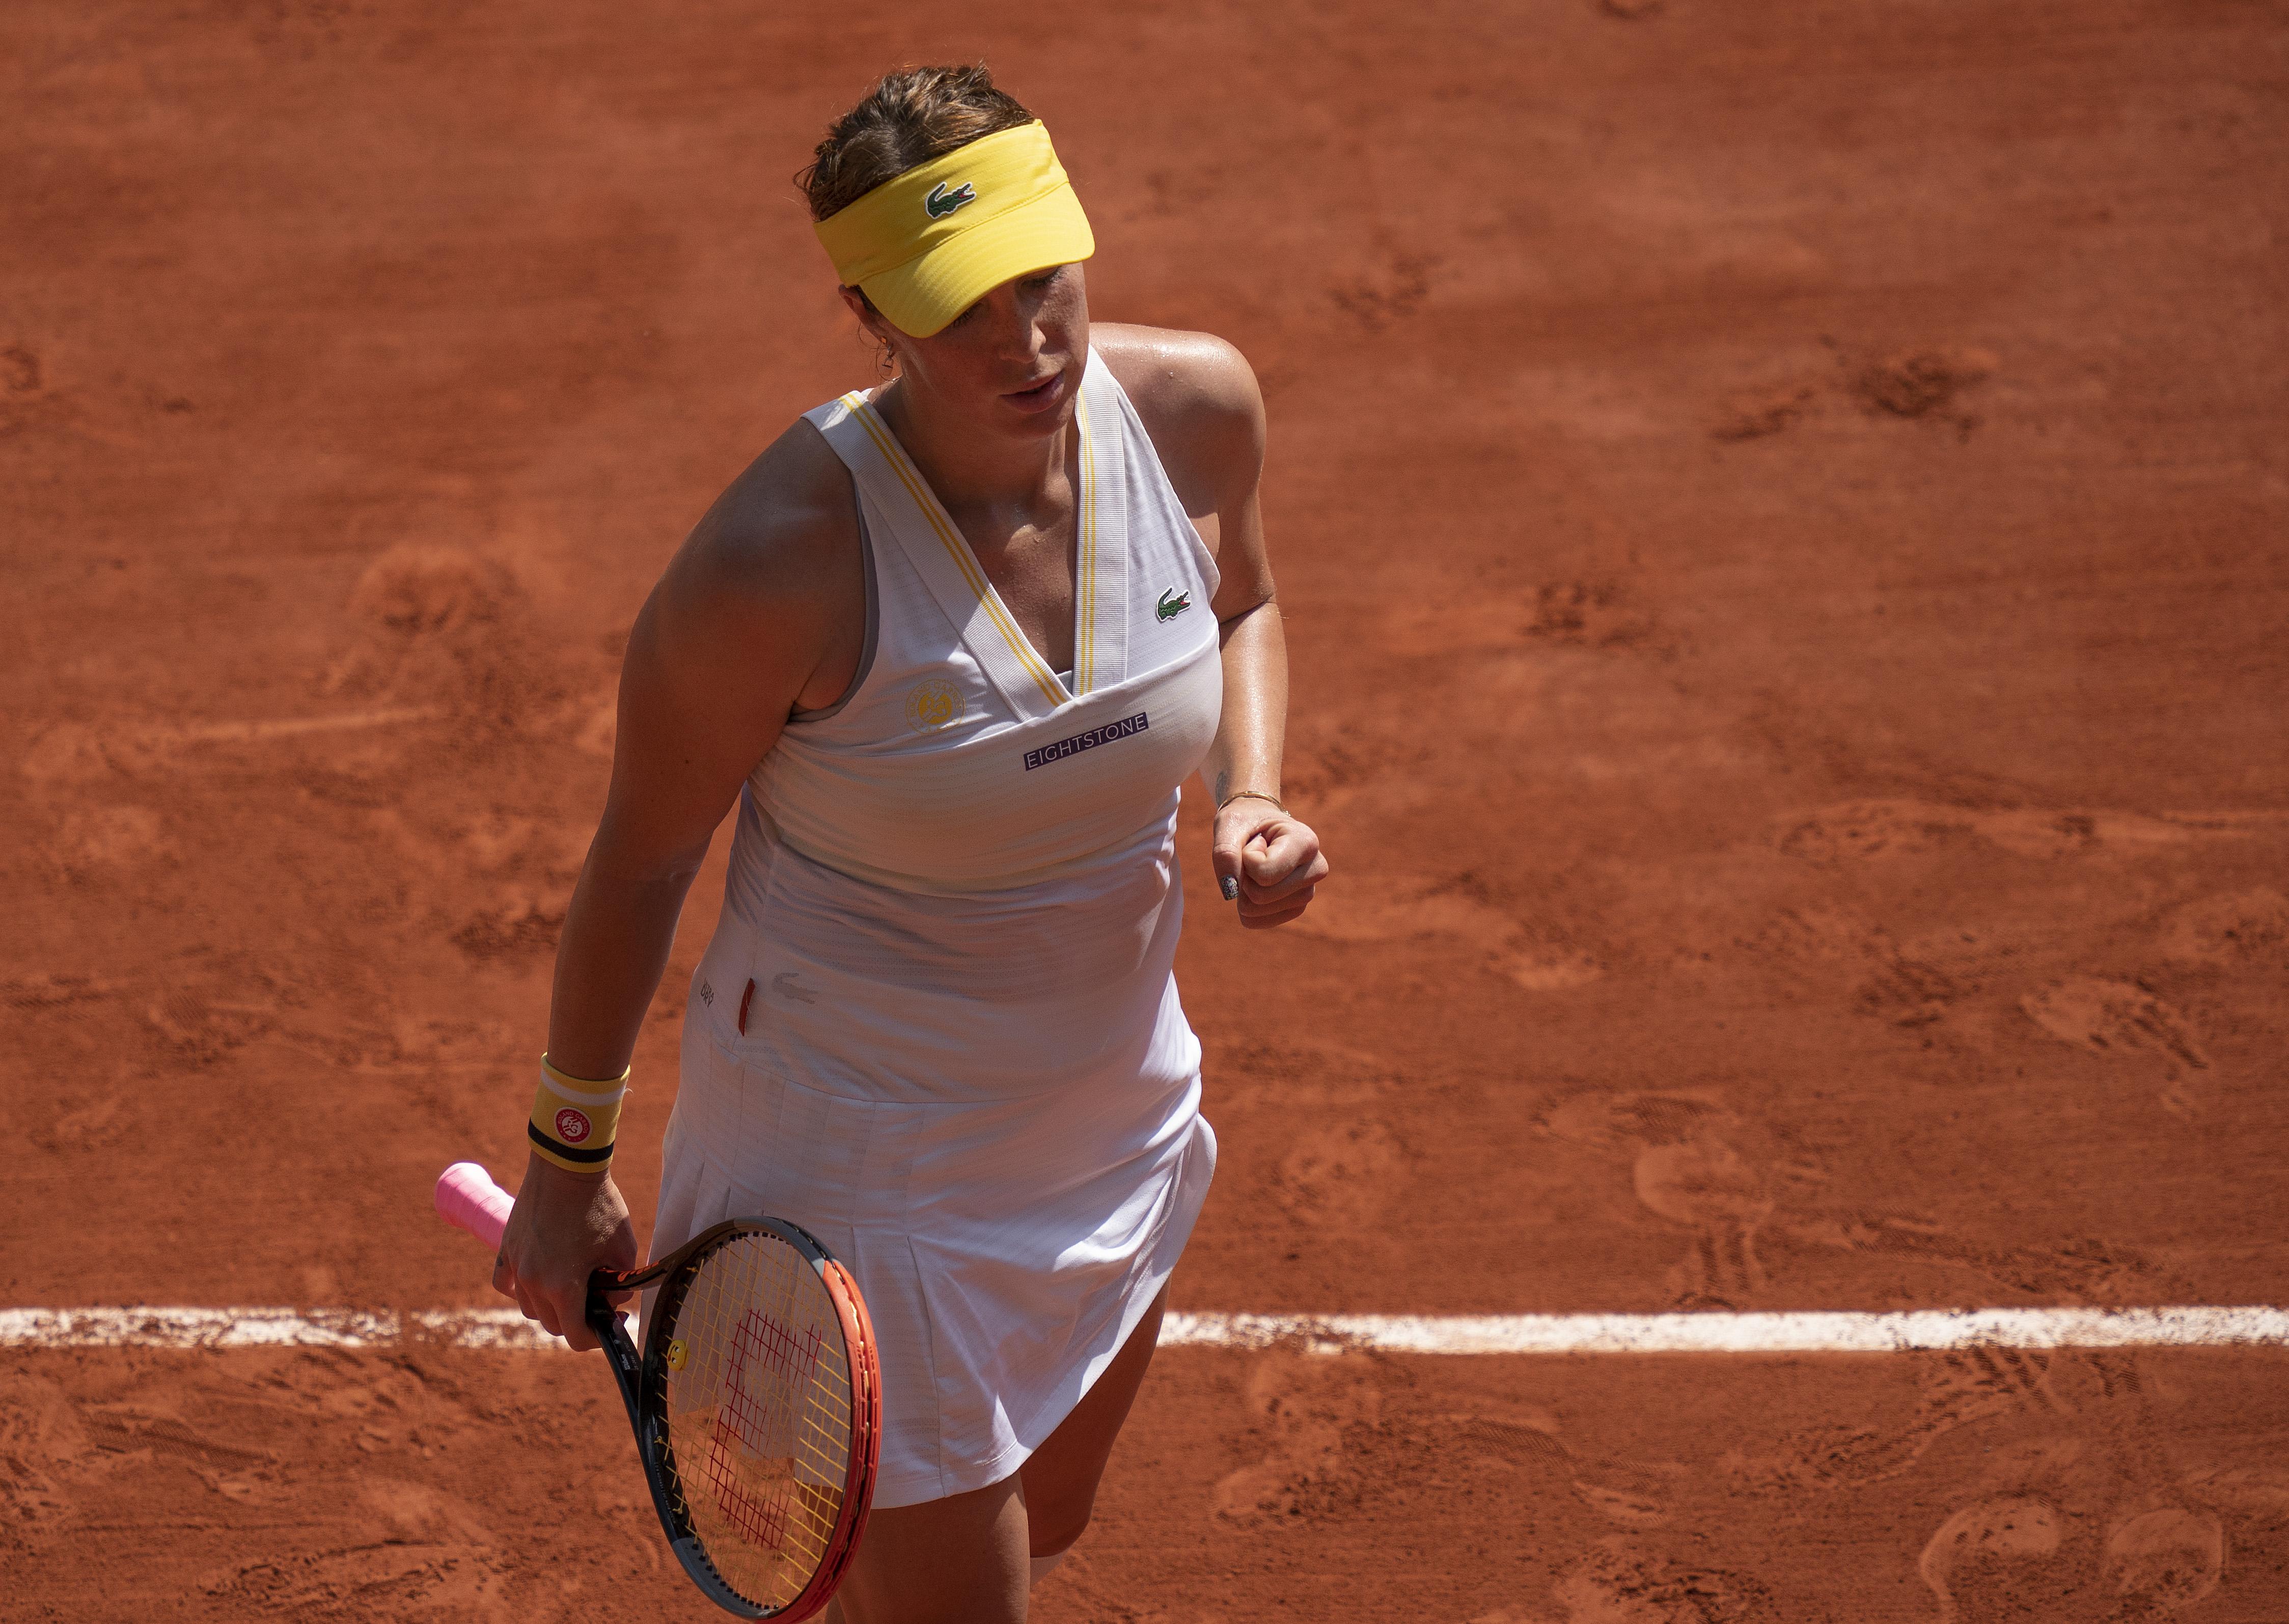 Jun 10, 2021; Paris, France; Anastasia Pavlyuchenkova (RUS) reacts during her match against Tamara Zidansek (SLO) on day 12 of the French Open at Stade Roland Garros. Mandatory Credit: Susan Mullane-USA TODAY Sports